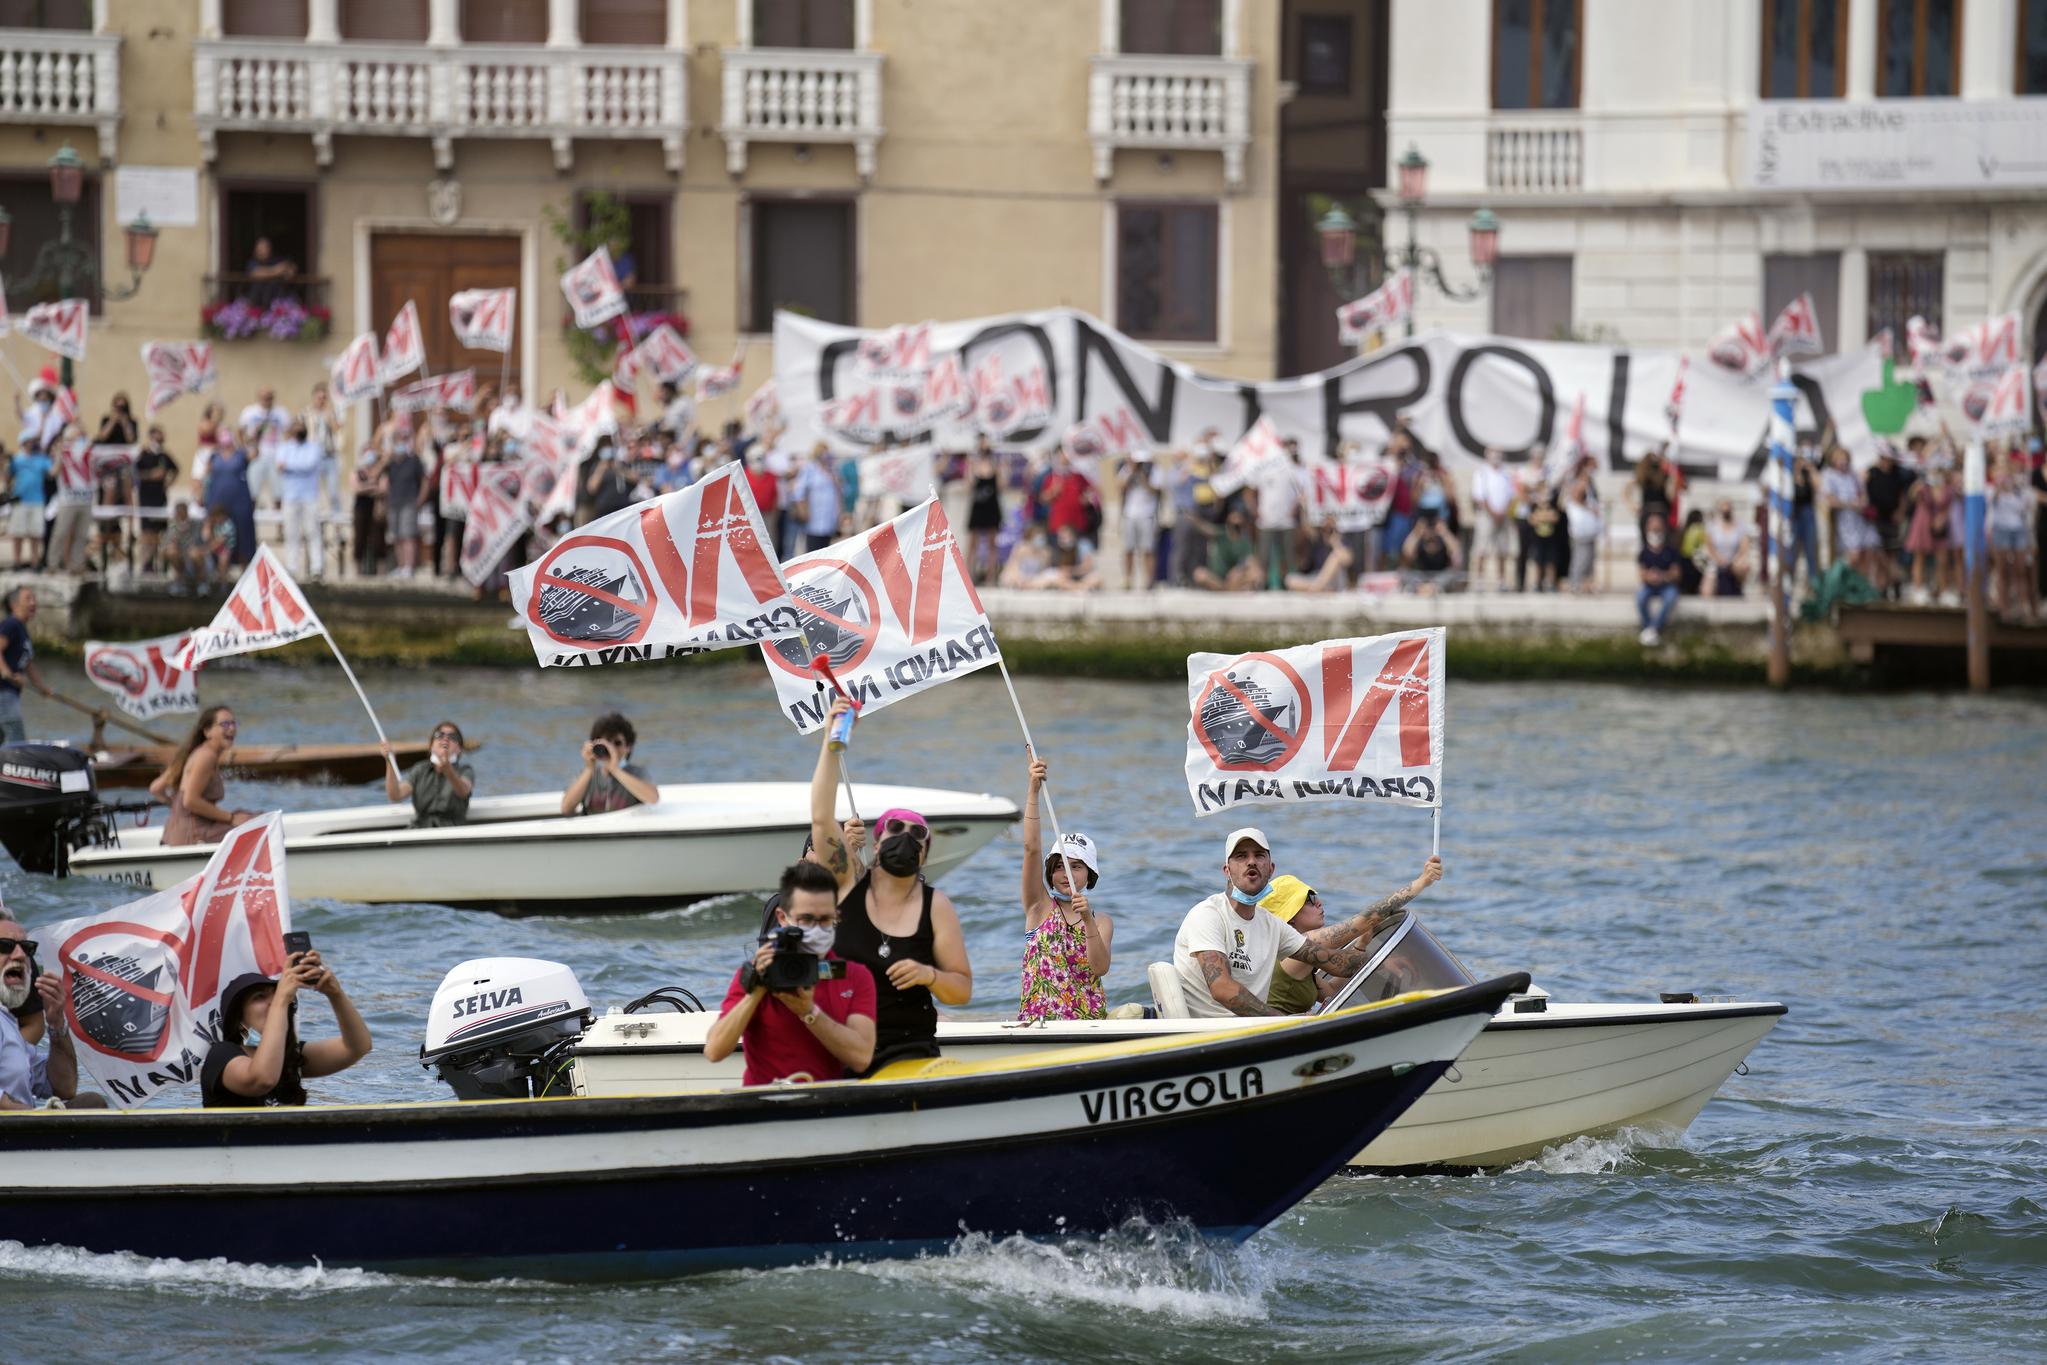 ″No Big Ships(큰 배는 안돼)″ 운동가들이 5일 MSC 오케스트라가 떠나는 베네치아 운하에서 수상 시위를 벌이고 있다. AP=연합뉴스